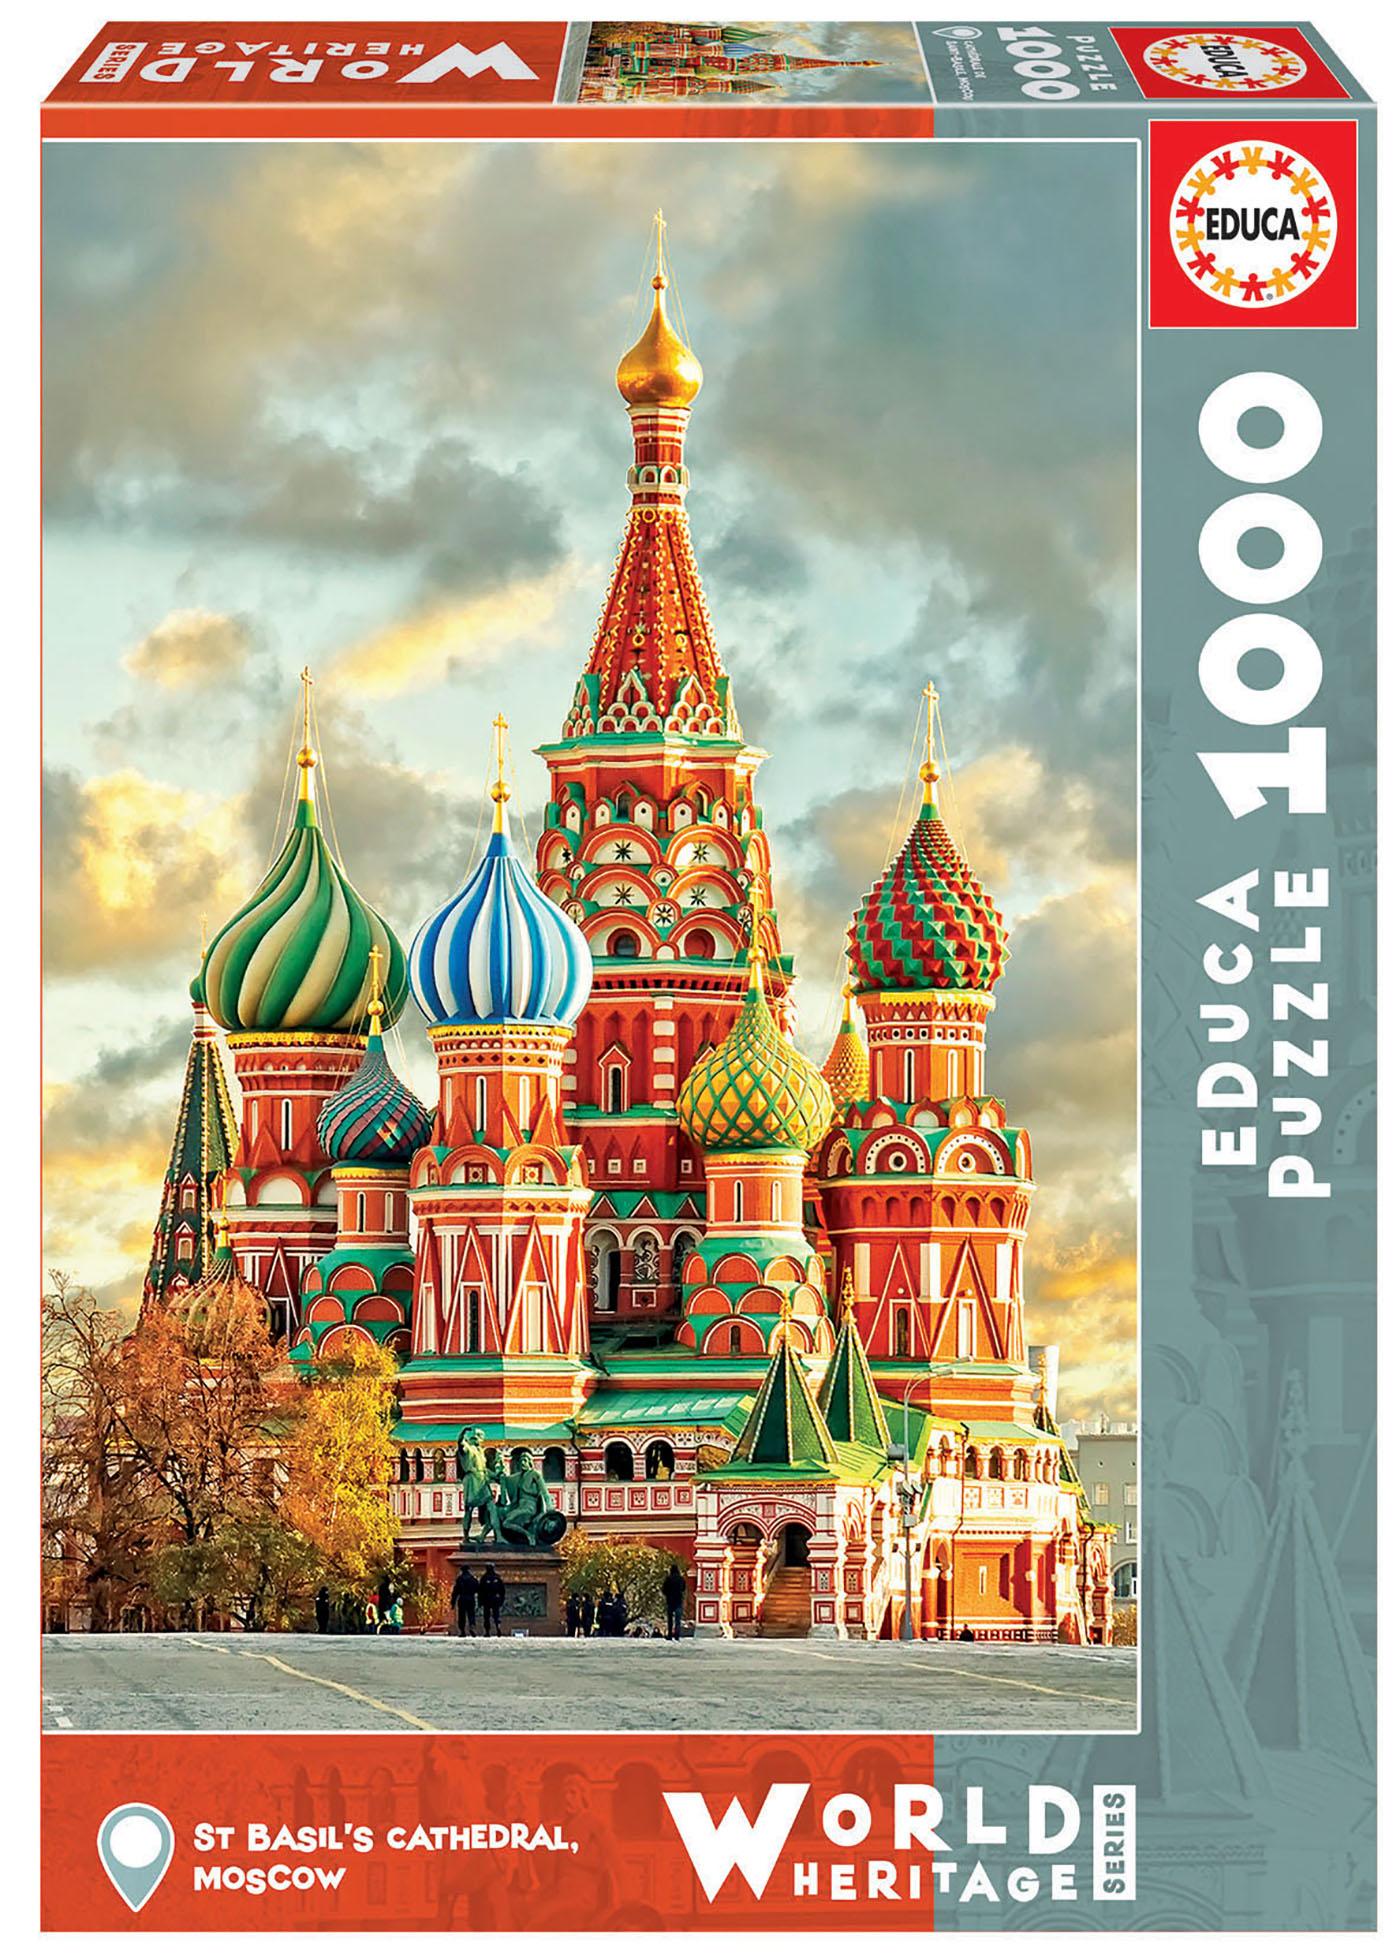 1000 Catedral de Sant Basili, Moscou